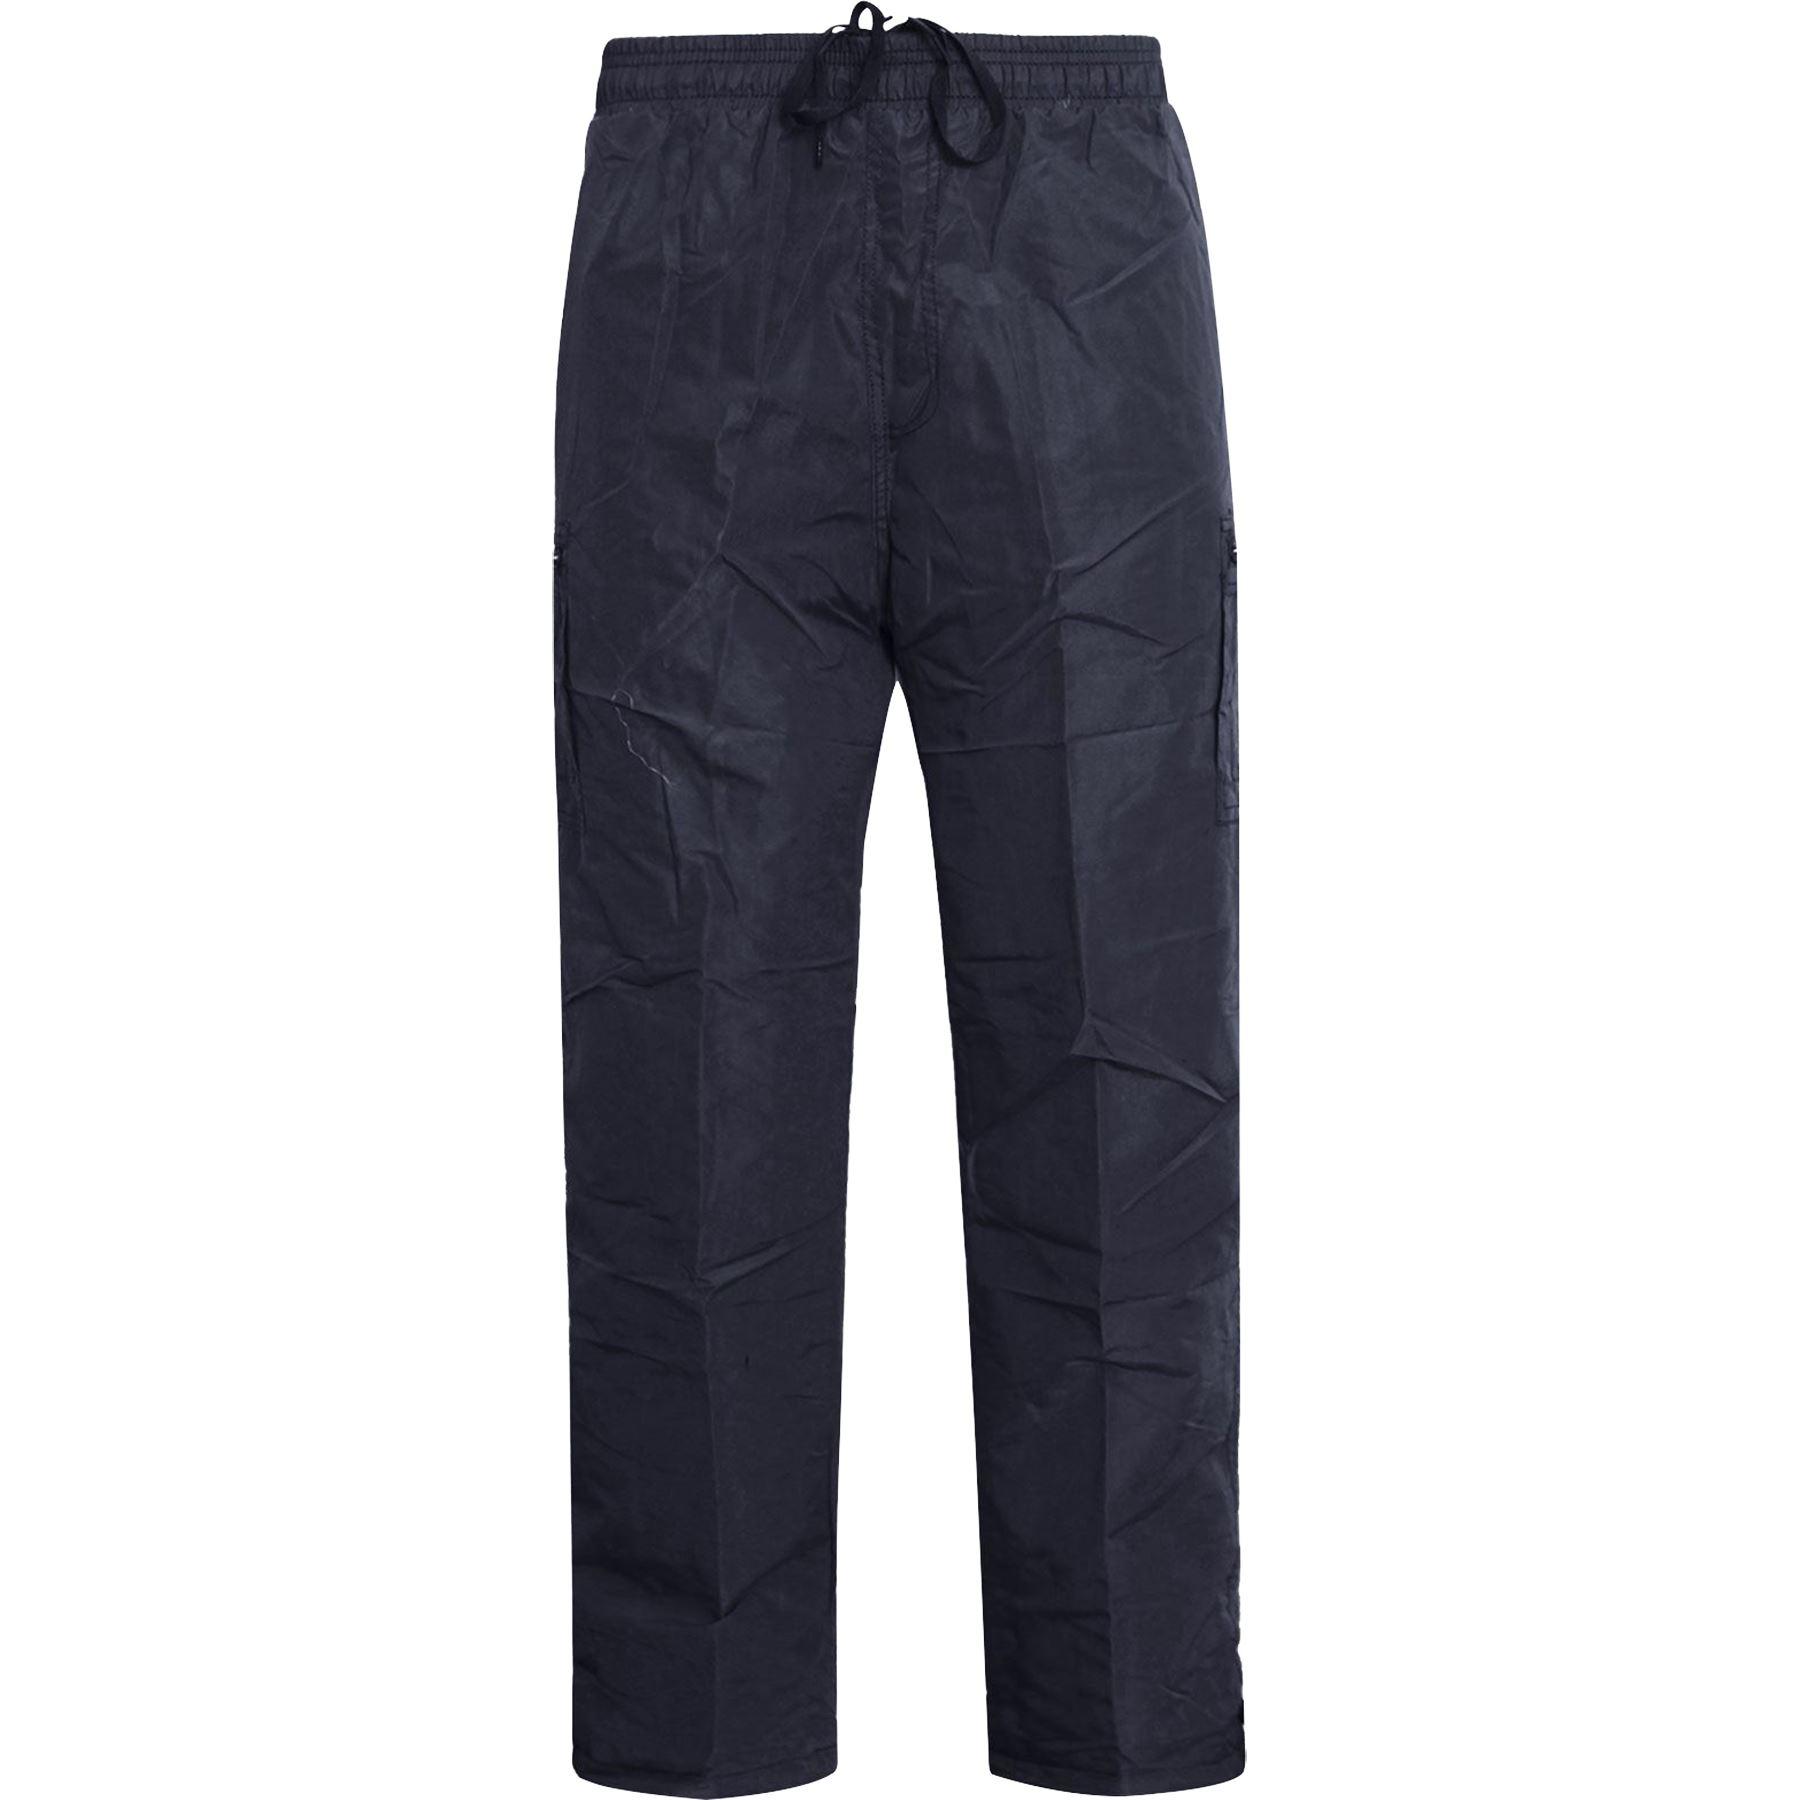 New-Mens-Lightweight-Elasticated-Cargo-Trousers-Combat-Work-Pants-Bottoms-M-XXL thumbnail 6